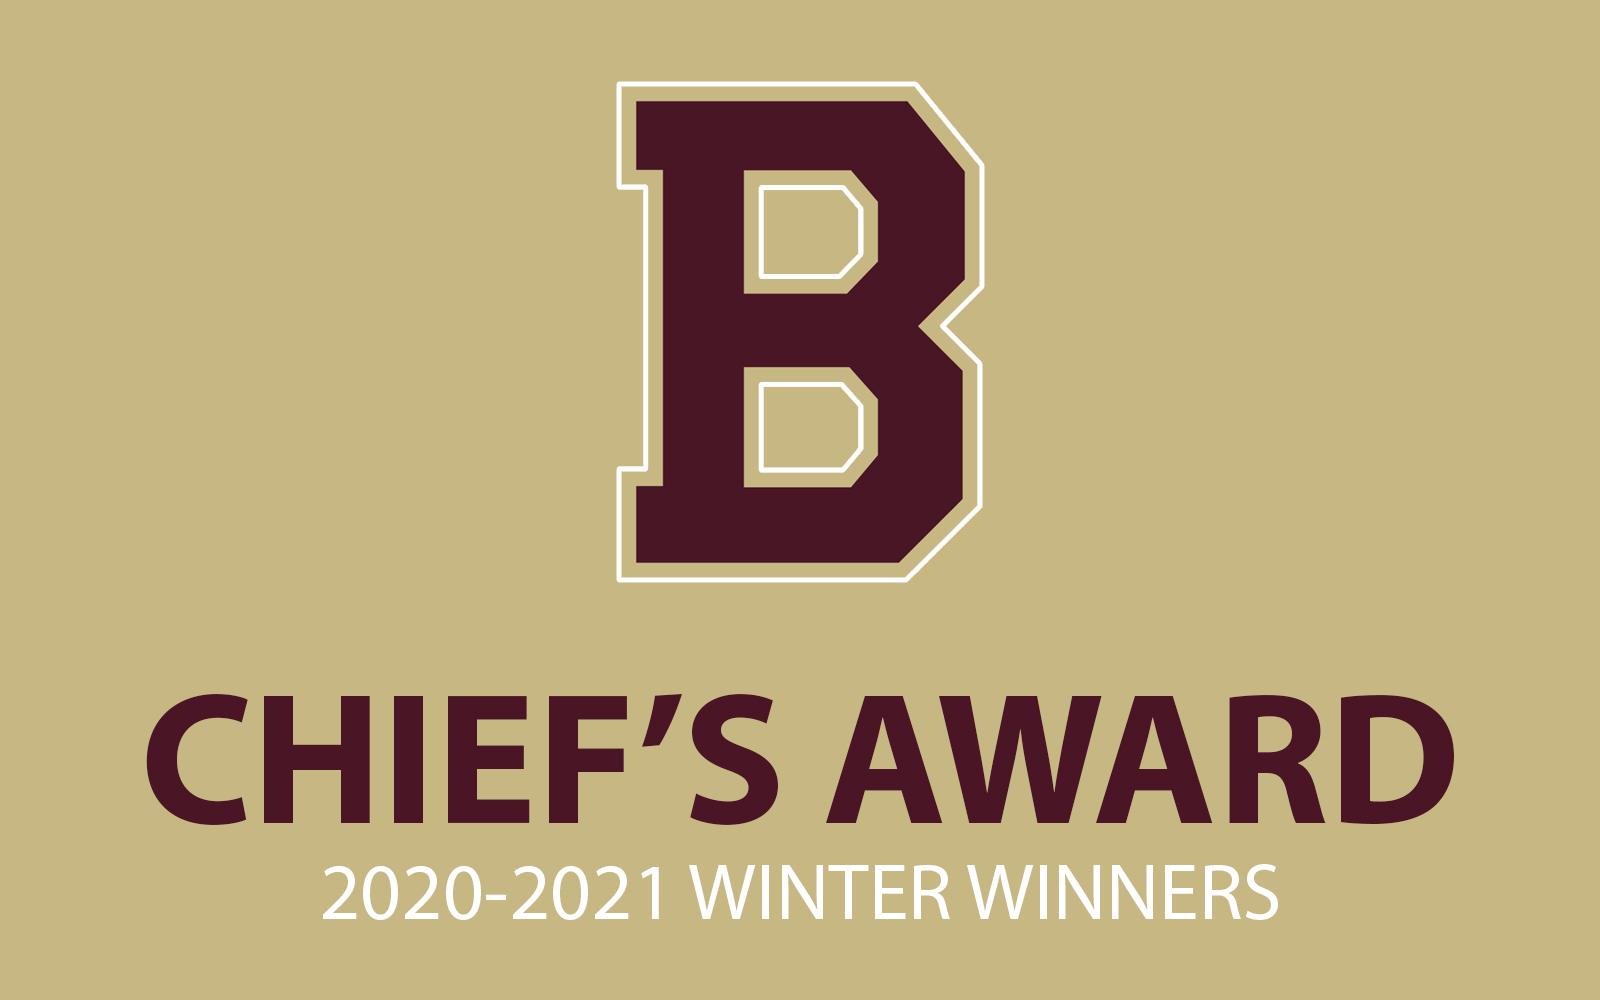 2020-2021 Winter Sport Chief's Award Winners